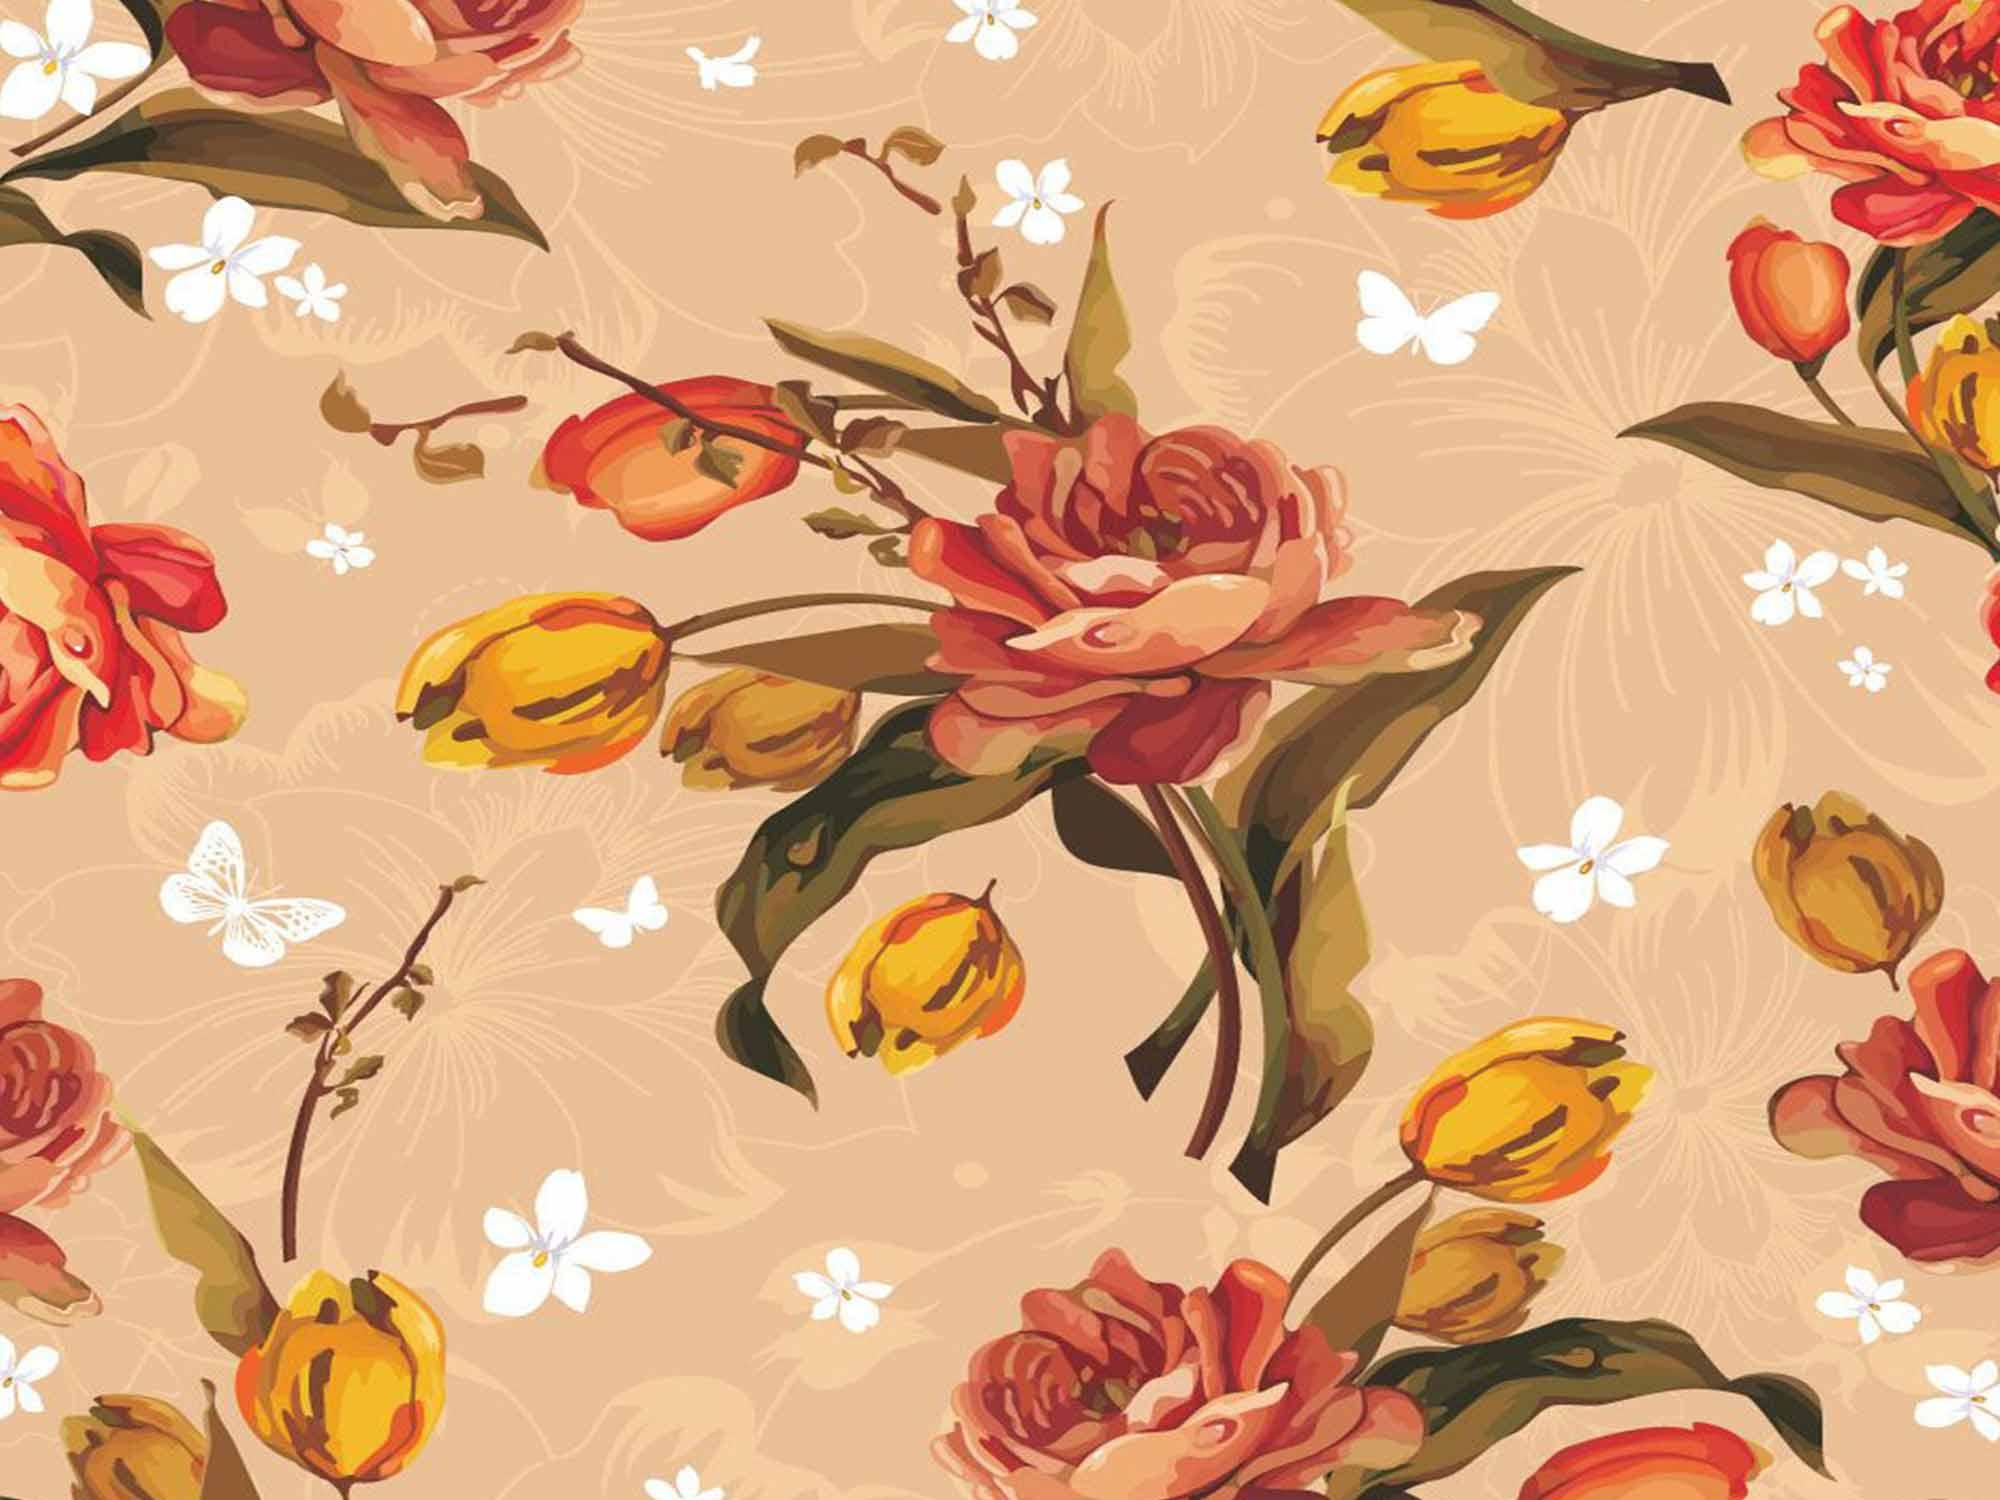 Papel de Parede Floral 0039 - Adesivos de Parede  - Paredes Decoradas